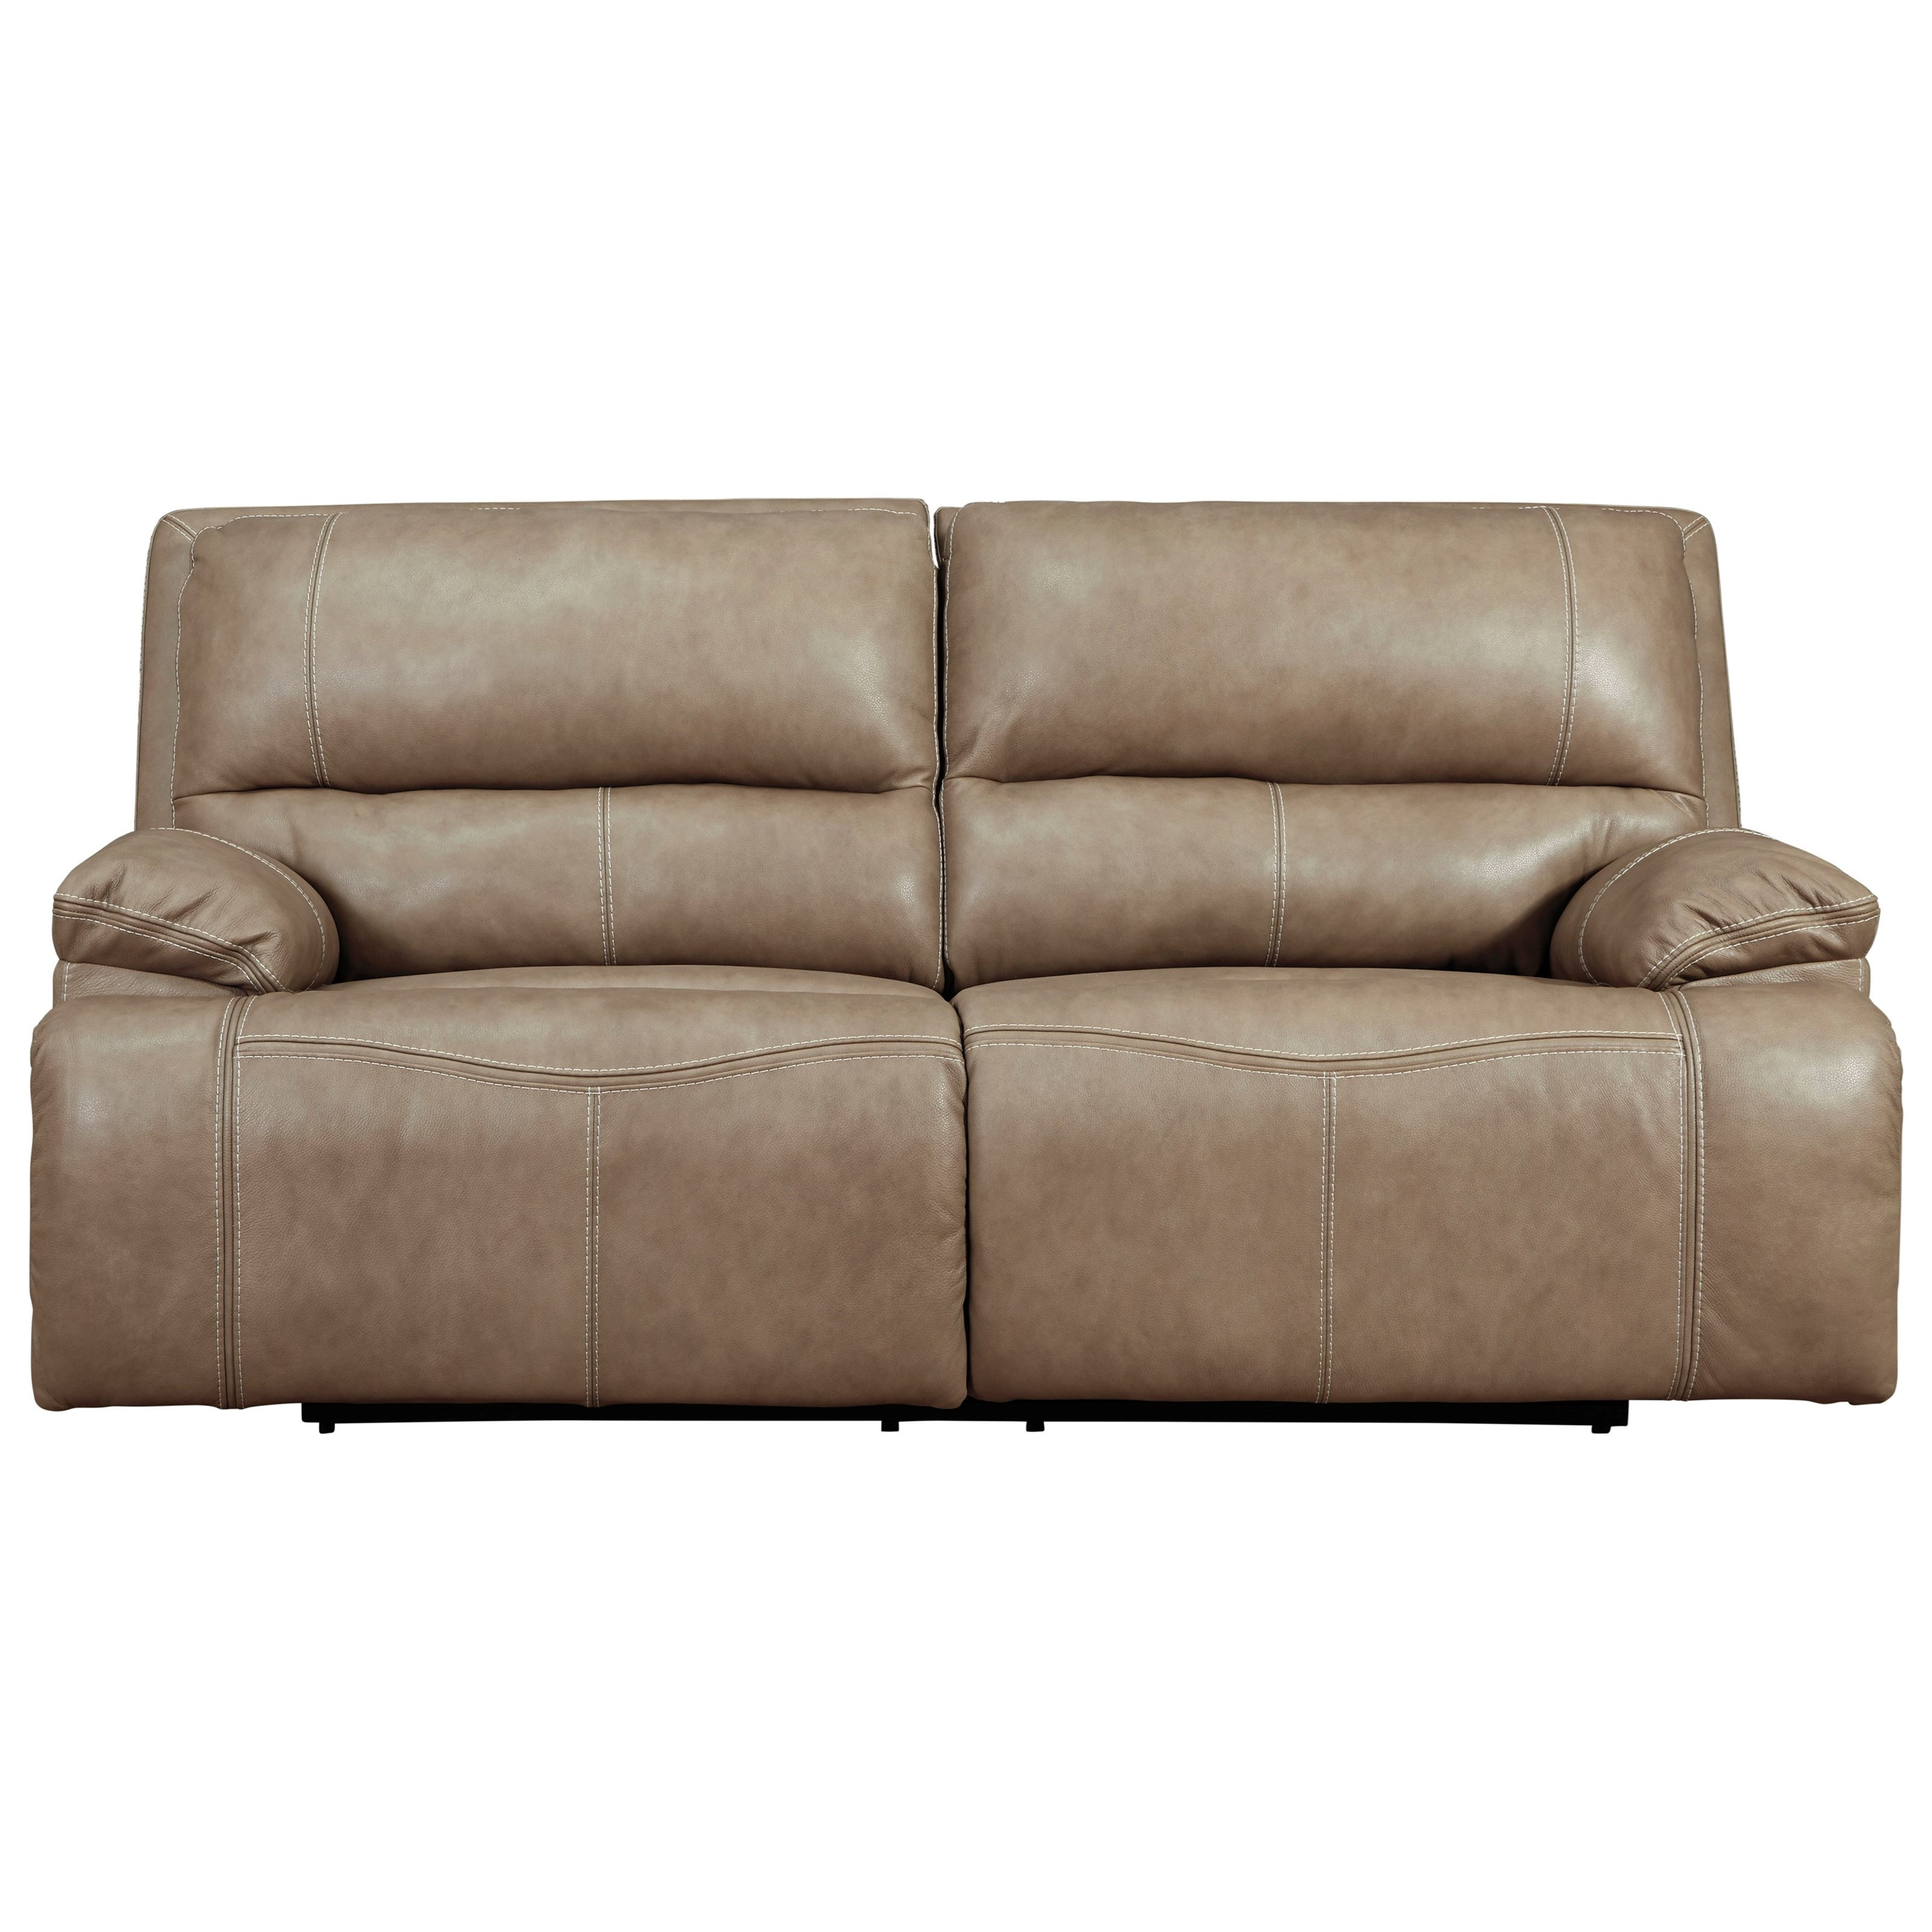 Ricmen Power Reclining Sofa by Signature Design by Ashley at HomeWorld Furniture